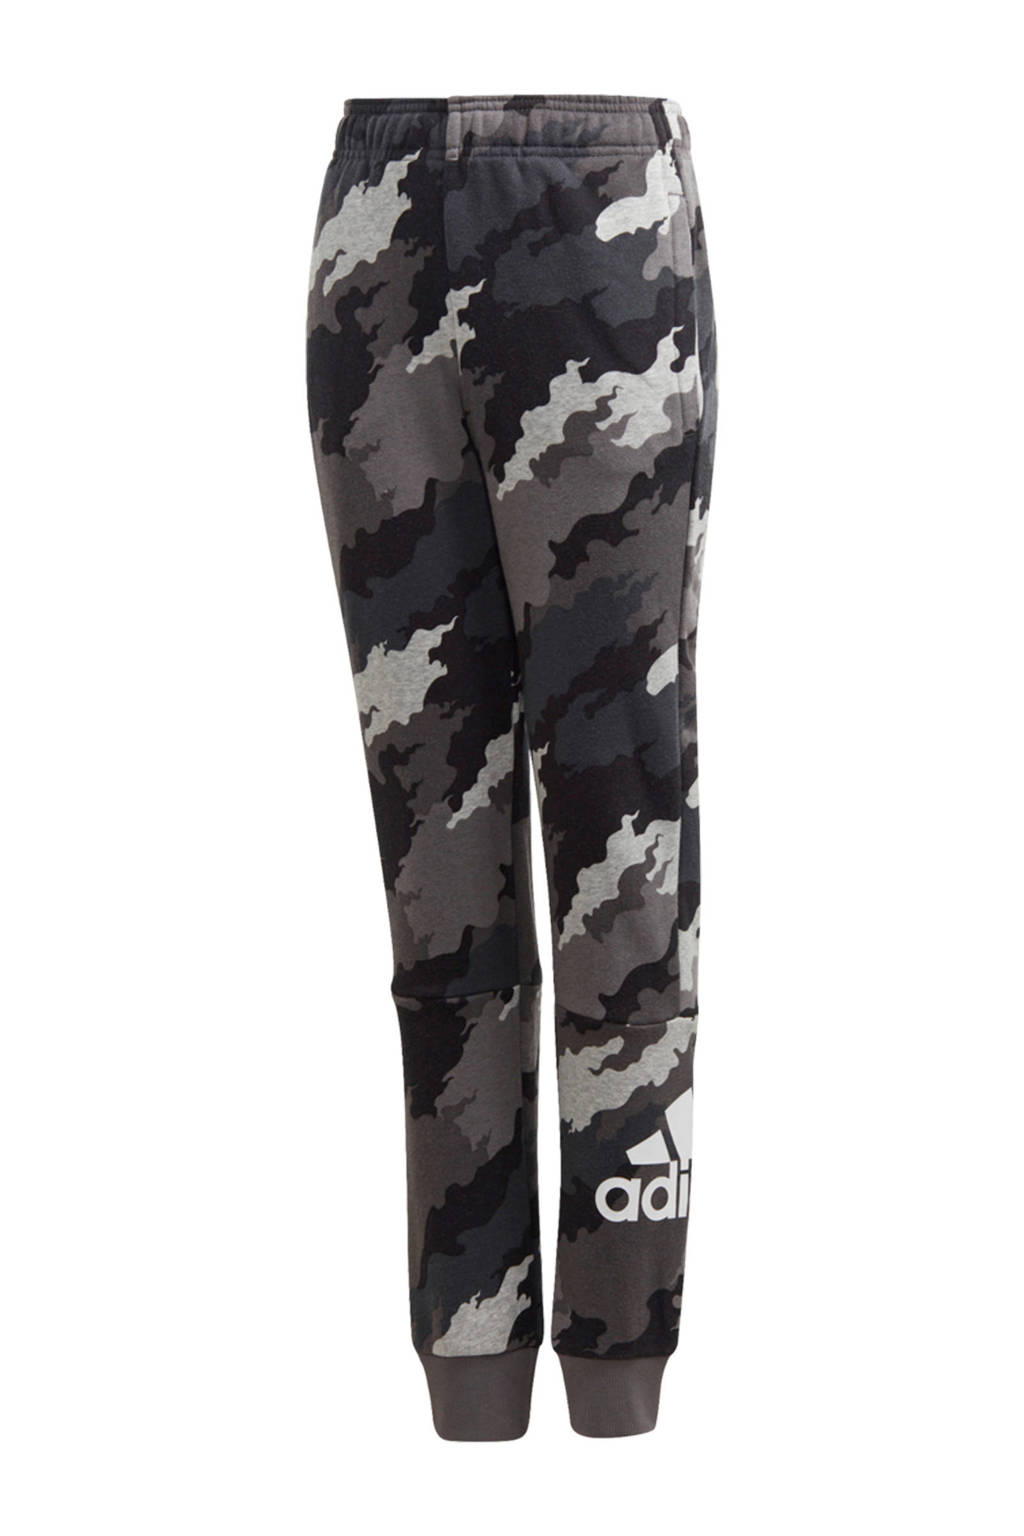 adidas Performance   joggingbroek donkergrijs/grijs, Donkergrijs/grijs